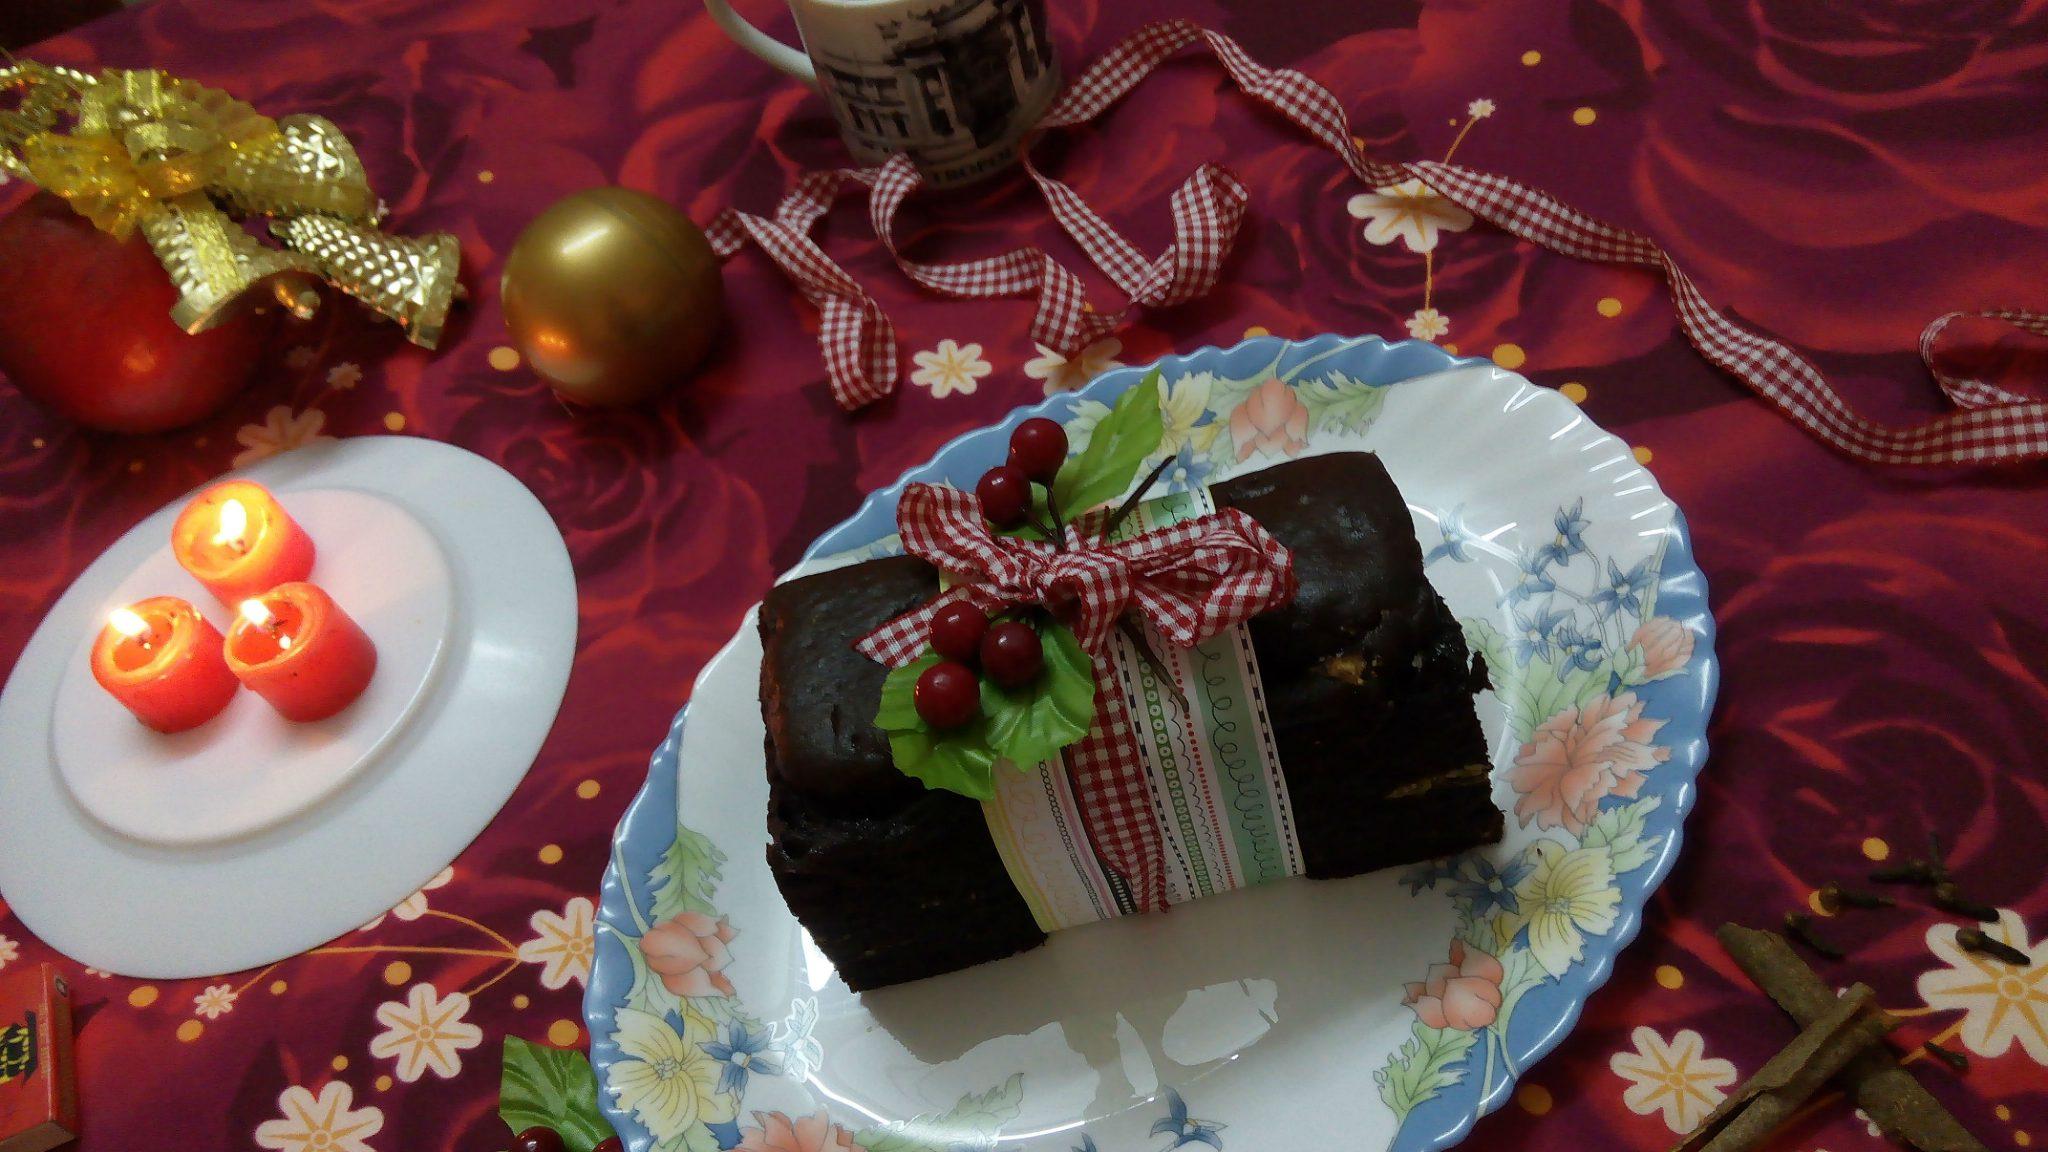 The Christmas recipe  – Coffee Pistachio Cake with Crunchy Caramel Surprise